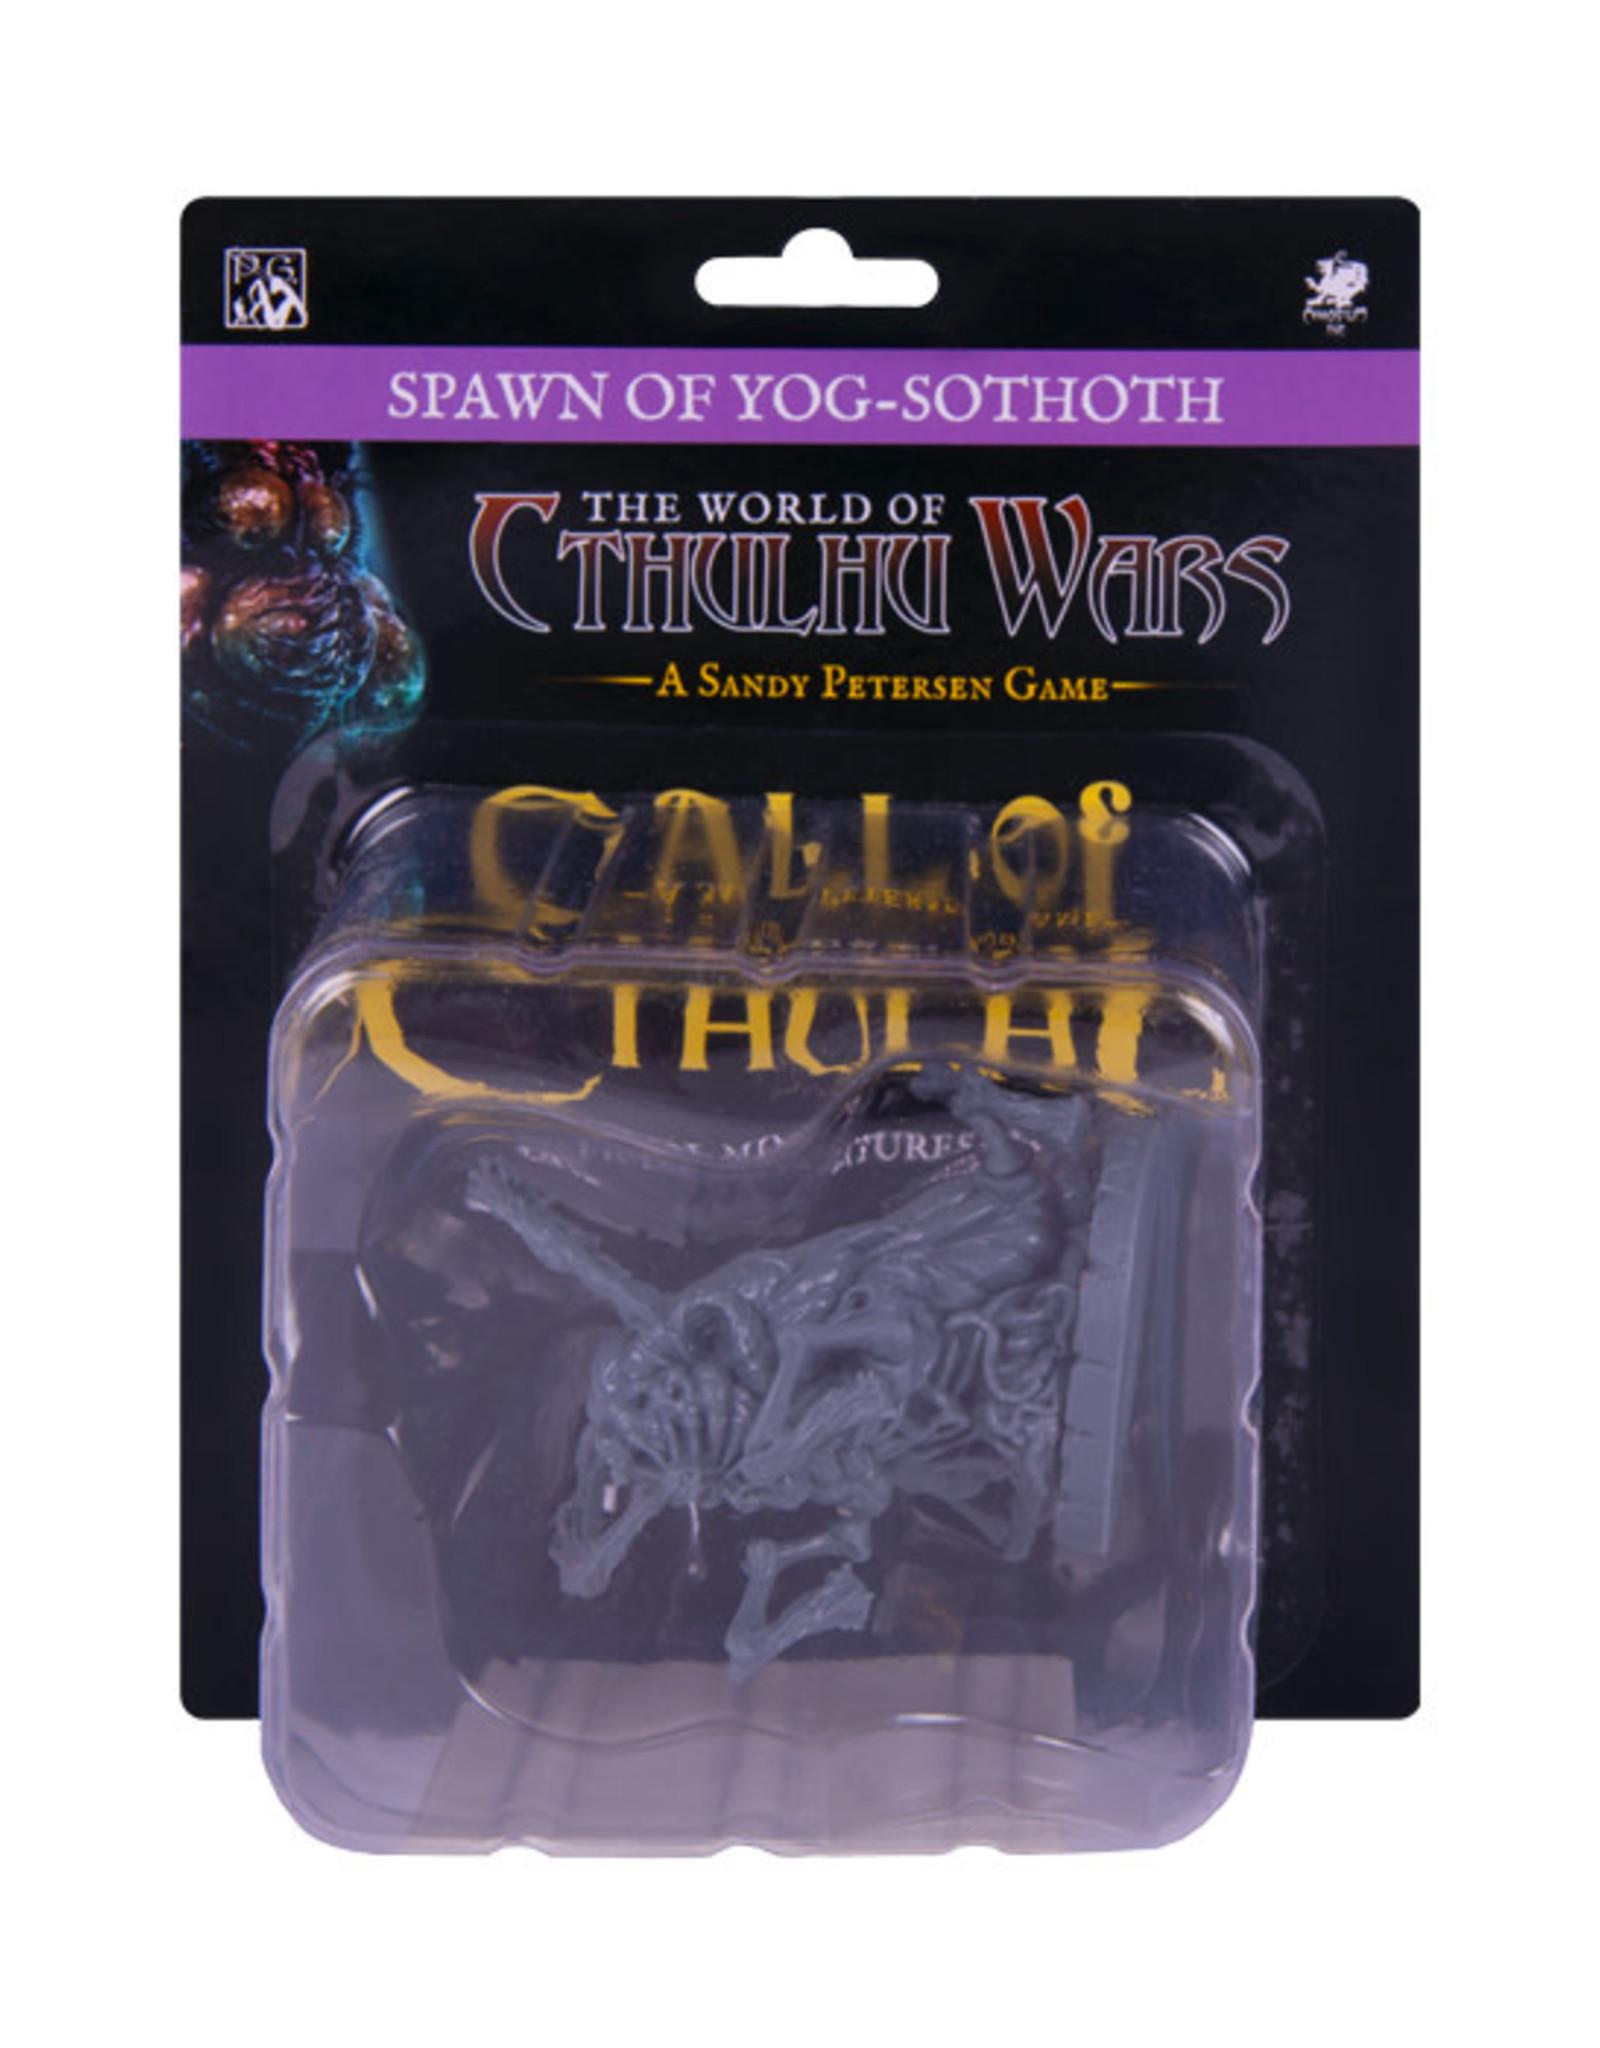 Call of Cthulhu: Miniature - Spawn of Yog-Sothoth